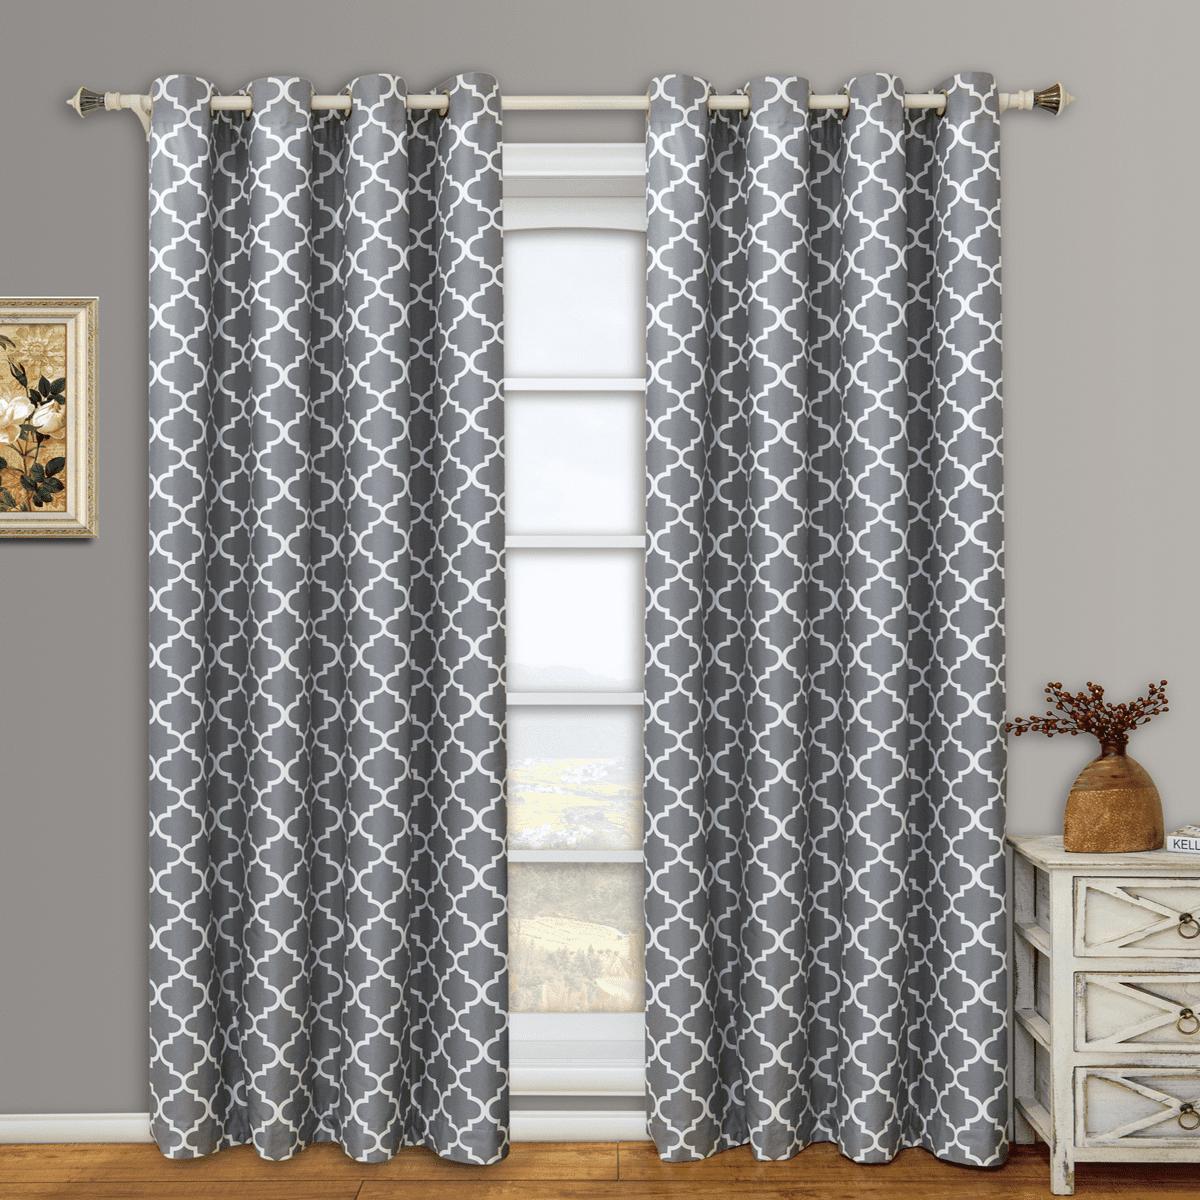 Pair Meridian Room Darkening Thermal-Insulated Grommet Window Curtain Panels ( Set of 2 ) - Coral - 104x84